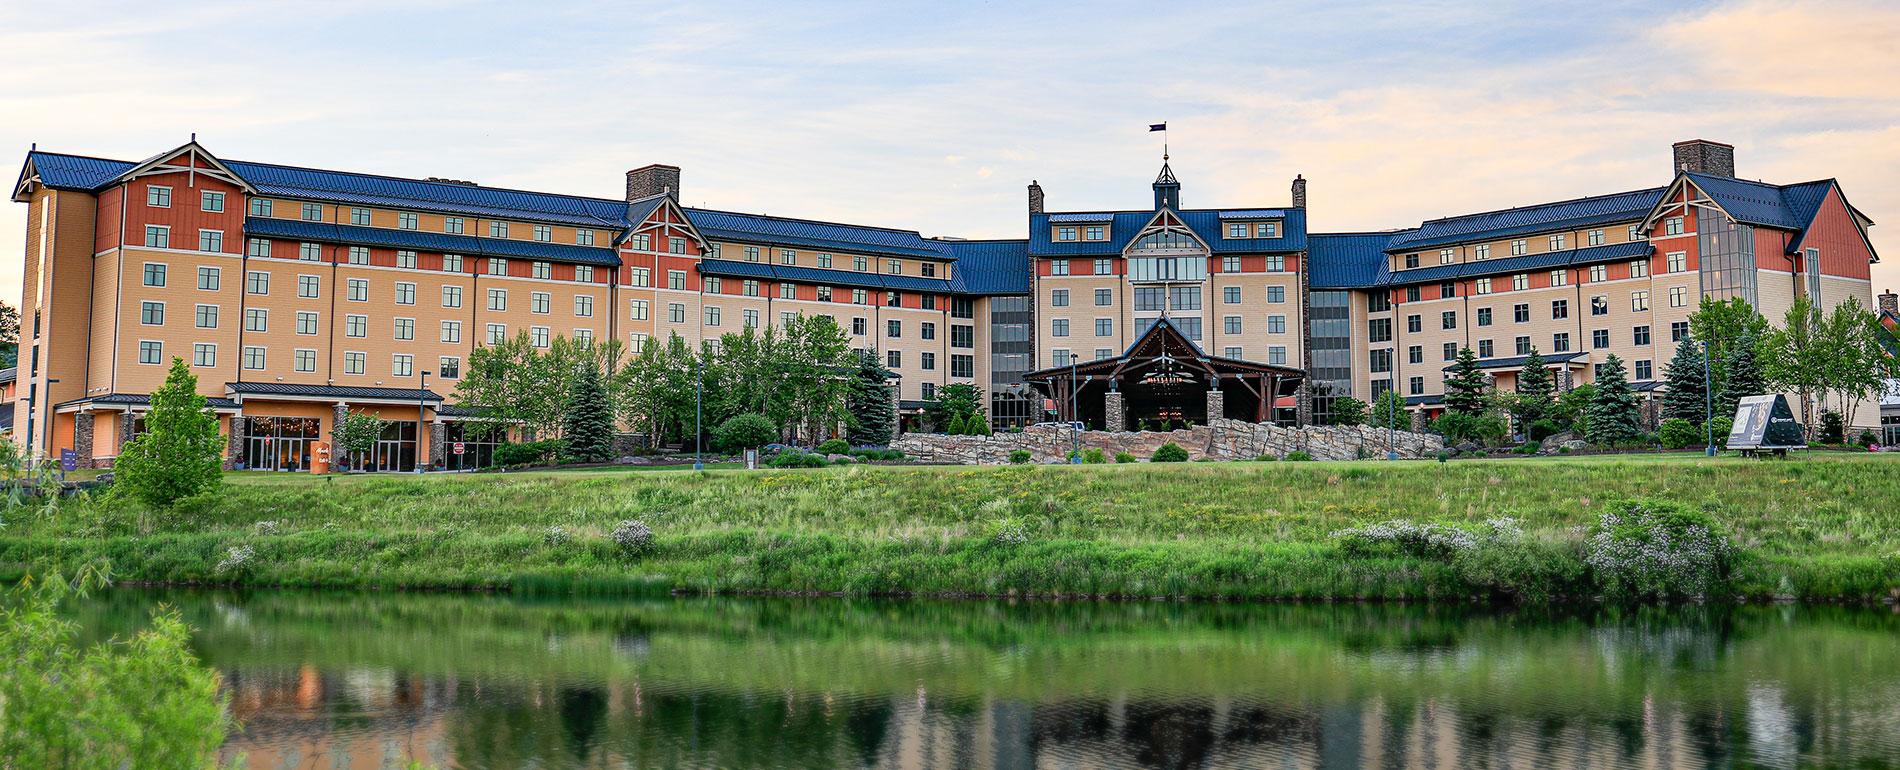 mt ponoco hotel casino spa exterior 2019